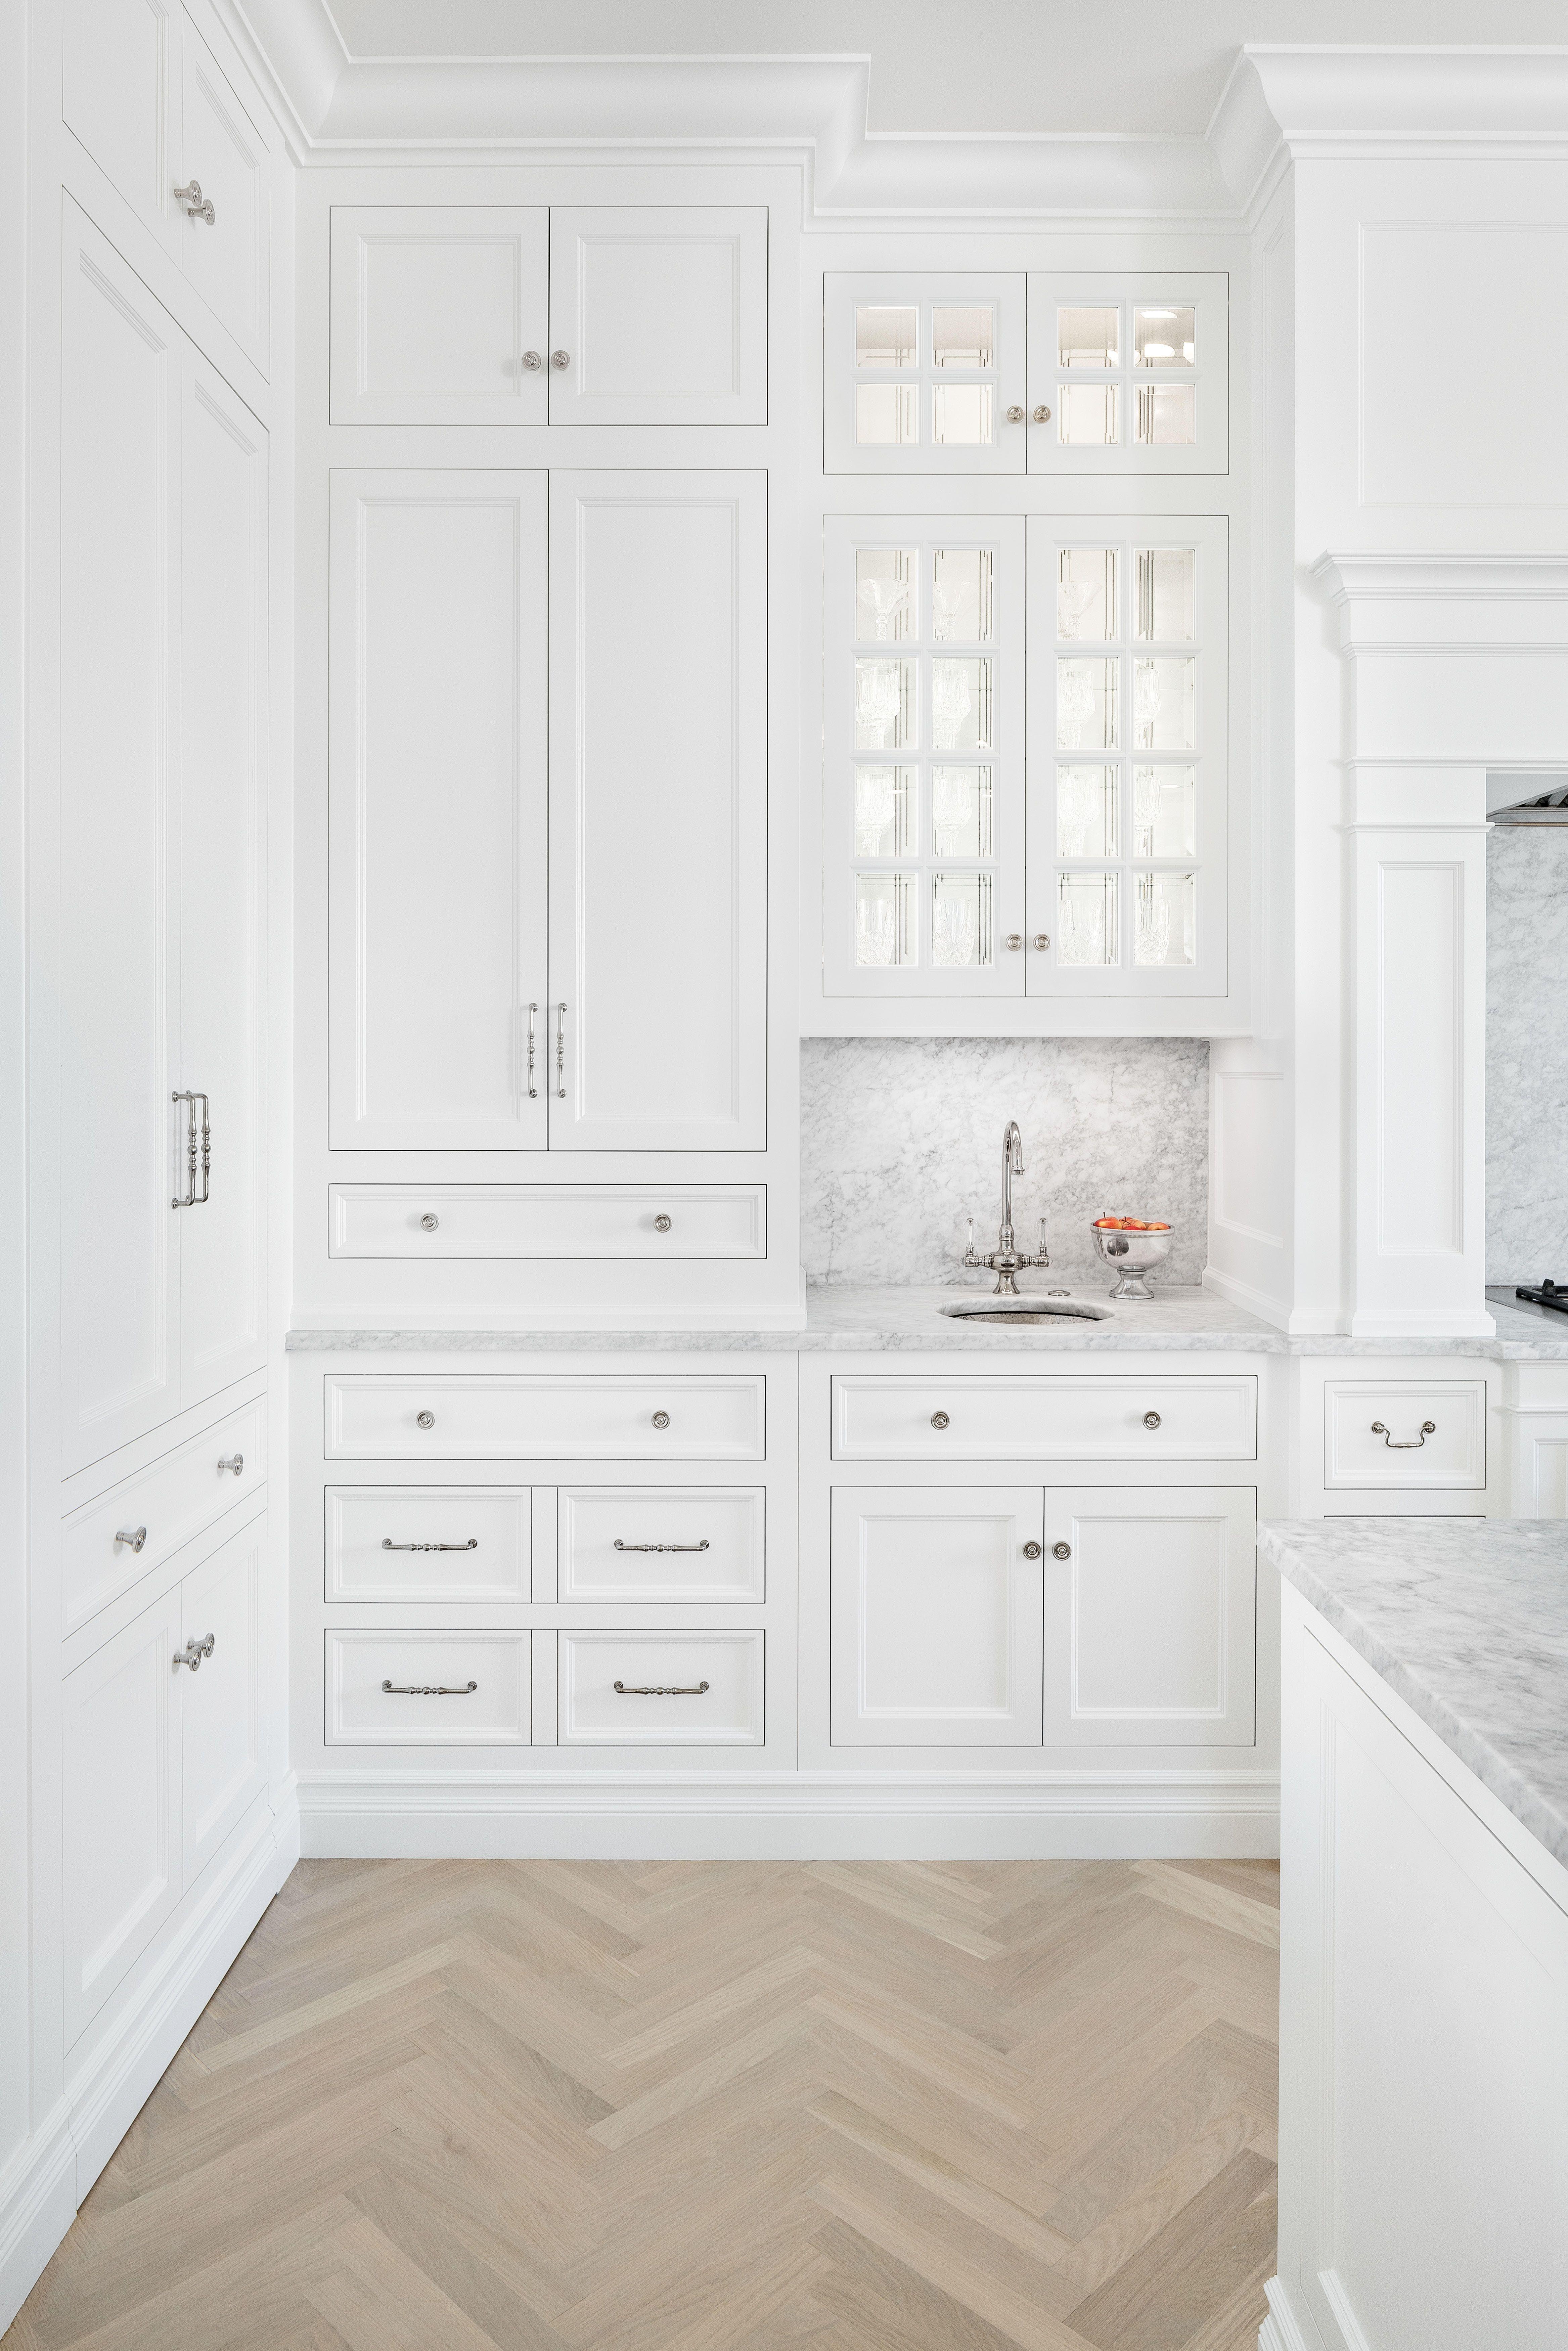 Designing Societysocialhome Inset Vs Overlay Cabinets Kitchen Cabinetry Design Cabinetry Design Luxury Kitchen Design